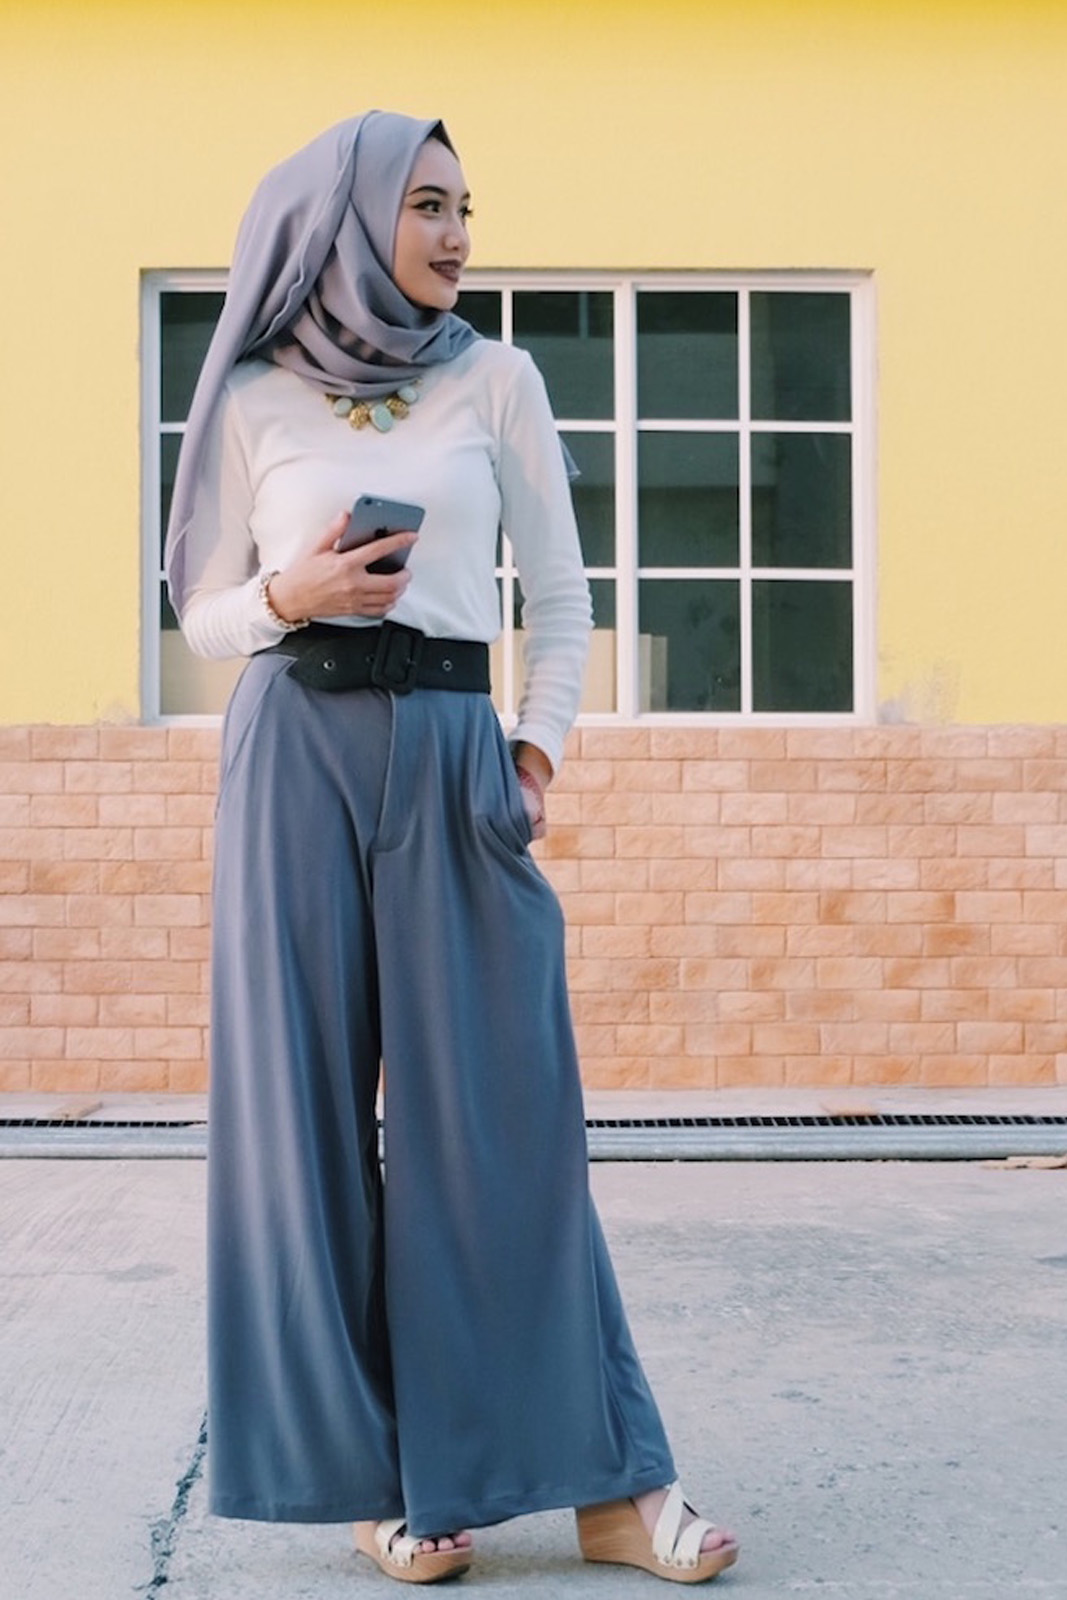 Tips Tampil Cantik Hijab dengan Padu-padan Celana